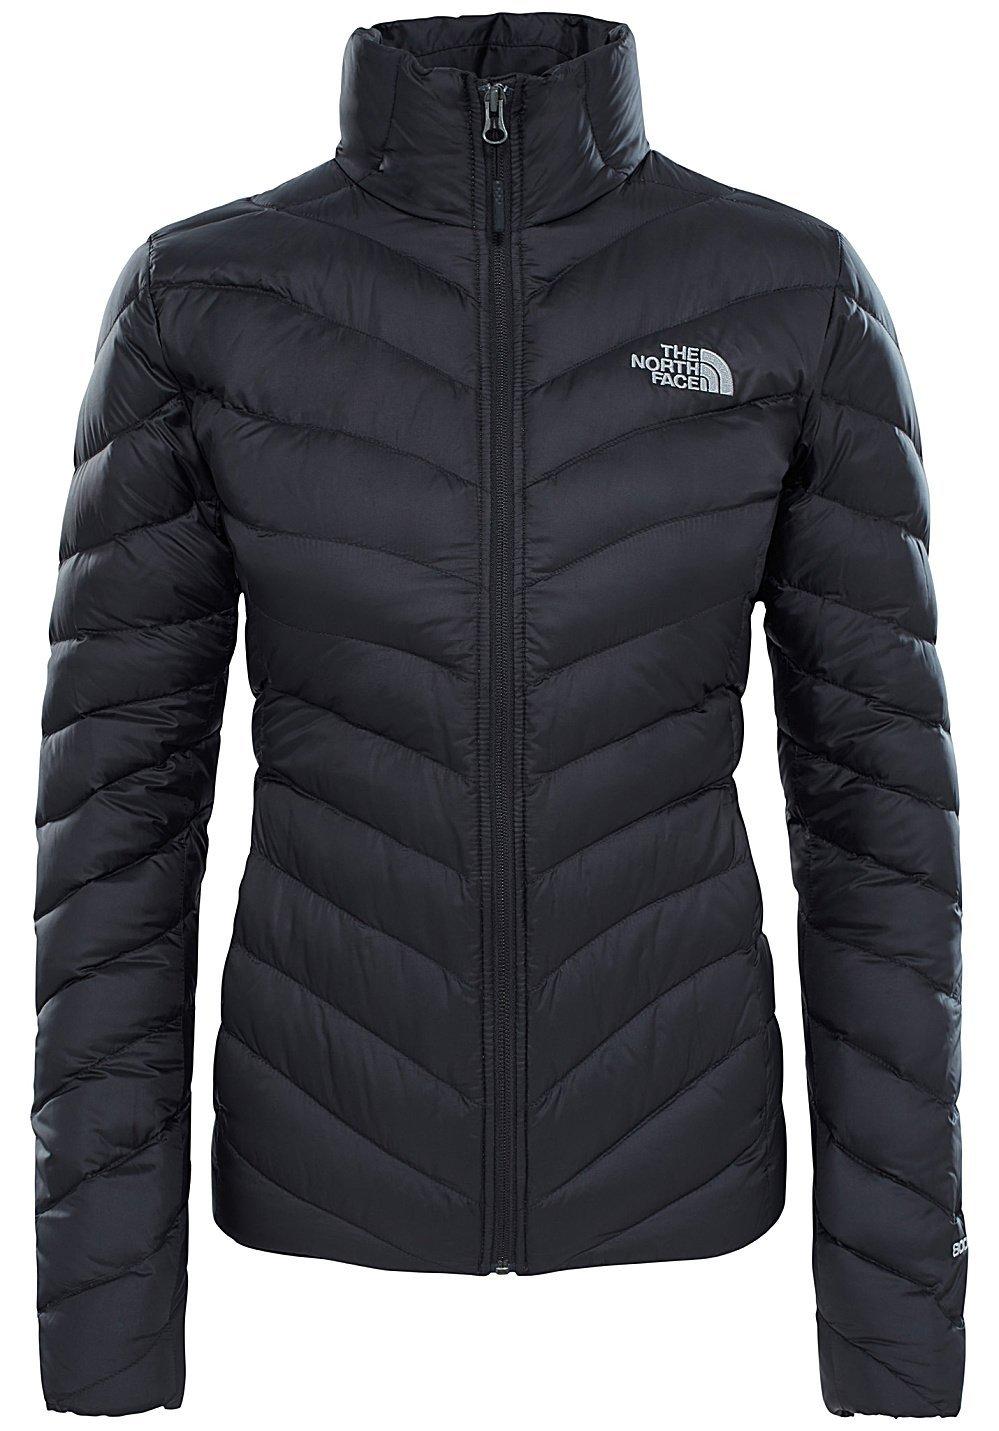 TALLA XS. The North Face W Trevail Jacket Chaqueta, Mujer, TNF Black, XS